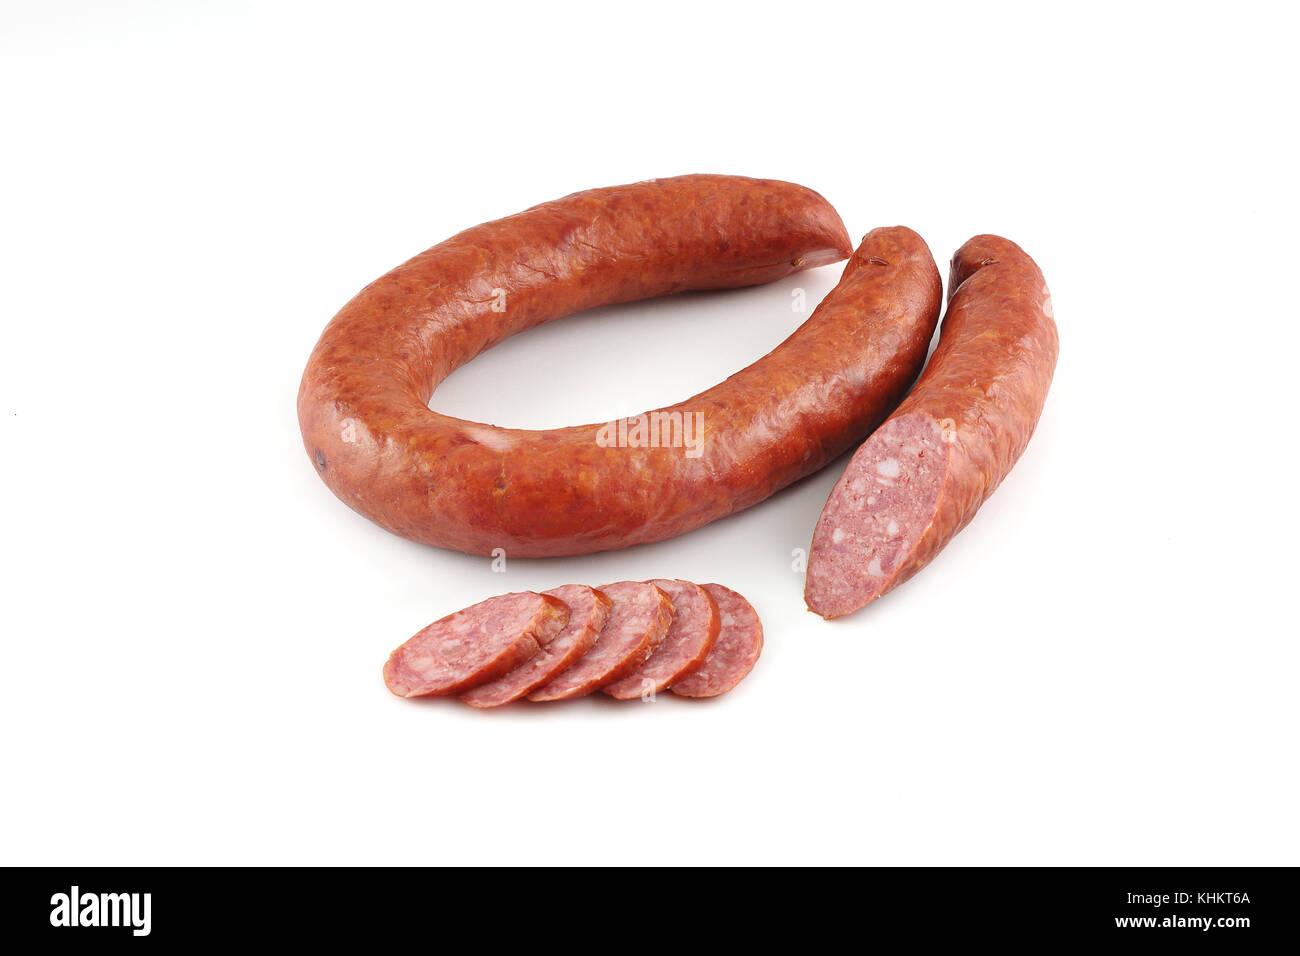 Sausage on a white background Stock Photo